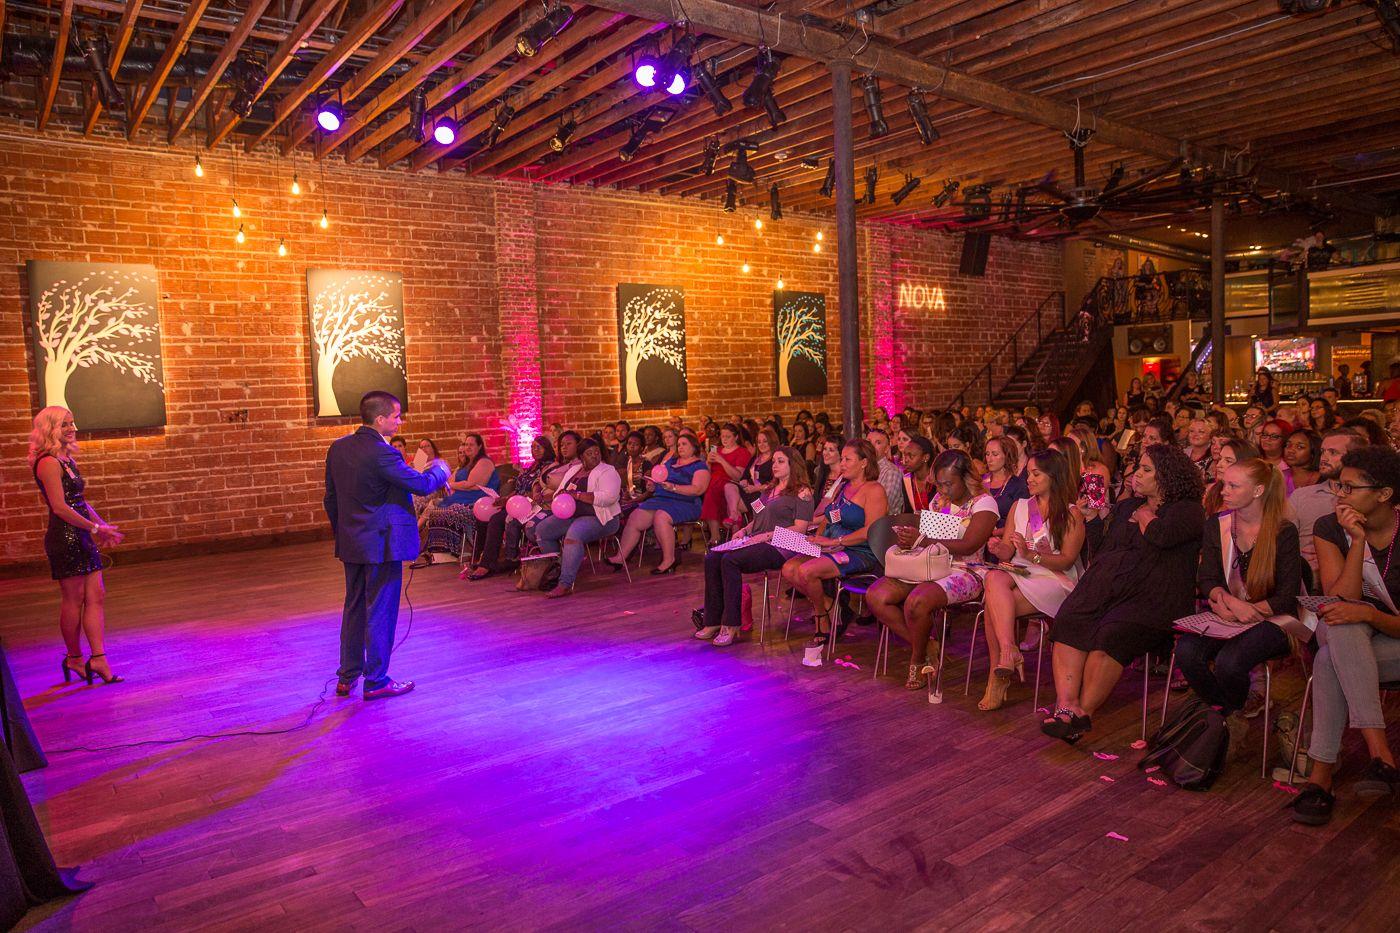 Mia's Pure Romance Returns with a Buzz to historic Downtown St. Pete venue NOVA 535